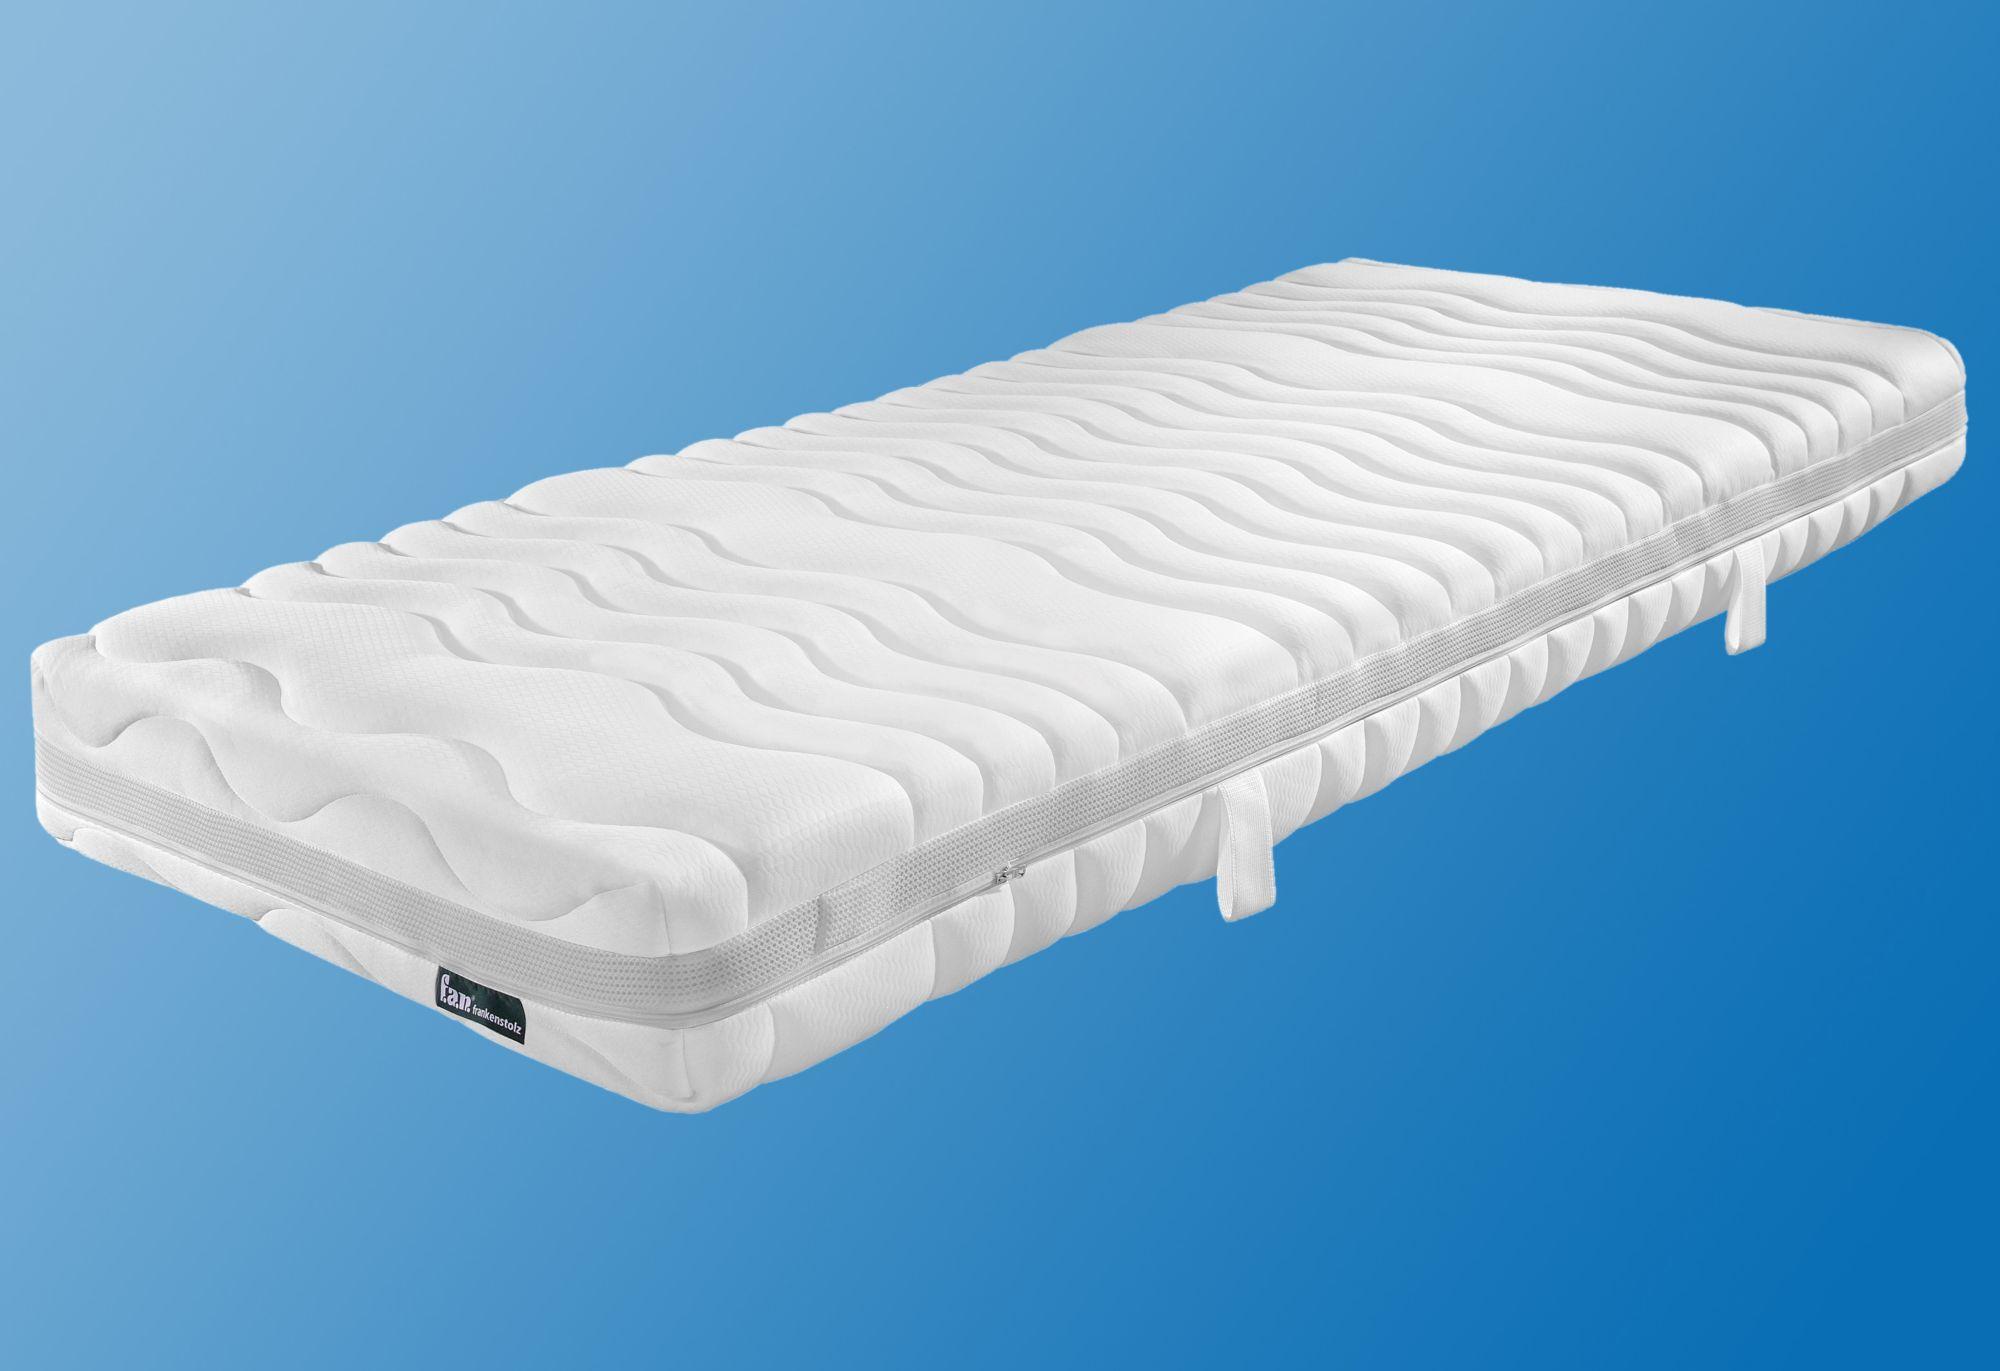 FAN FRANKENSTOLZ Komfortschaummatratze, »Climasan Relax 440 S«, f.a.n. Frankenstolz, 19 cm hoch, Raumgewicht: 30